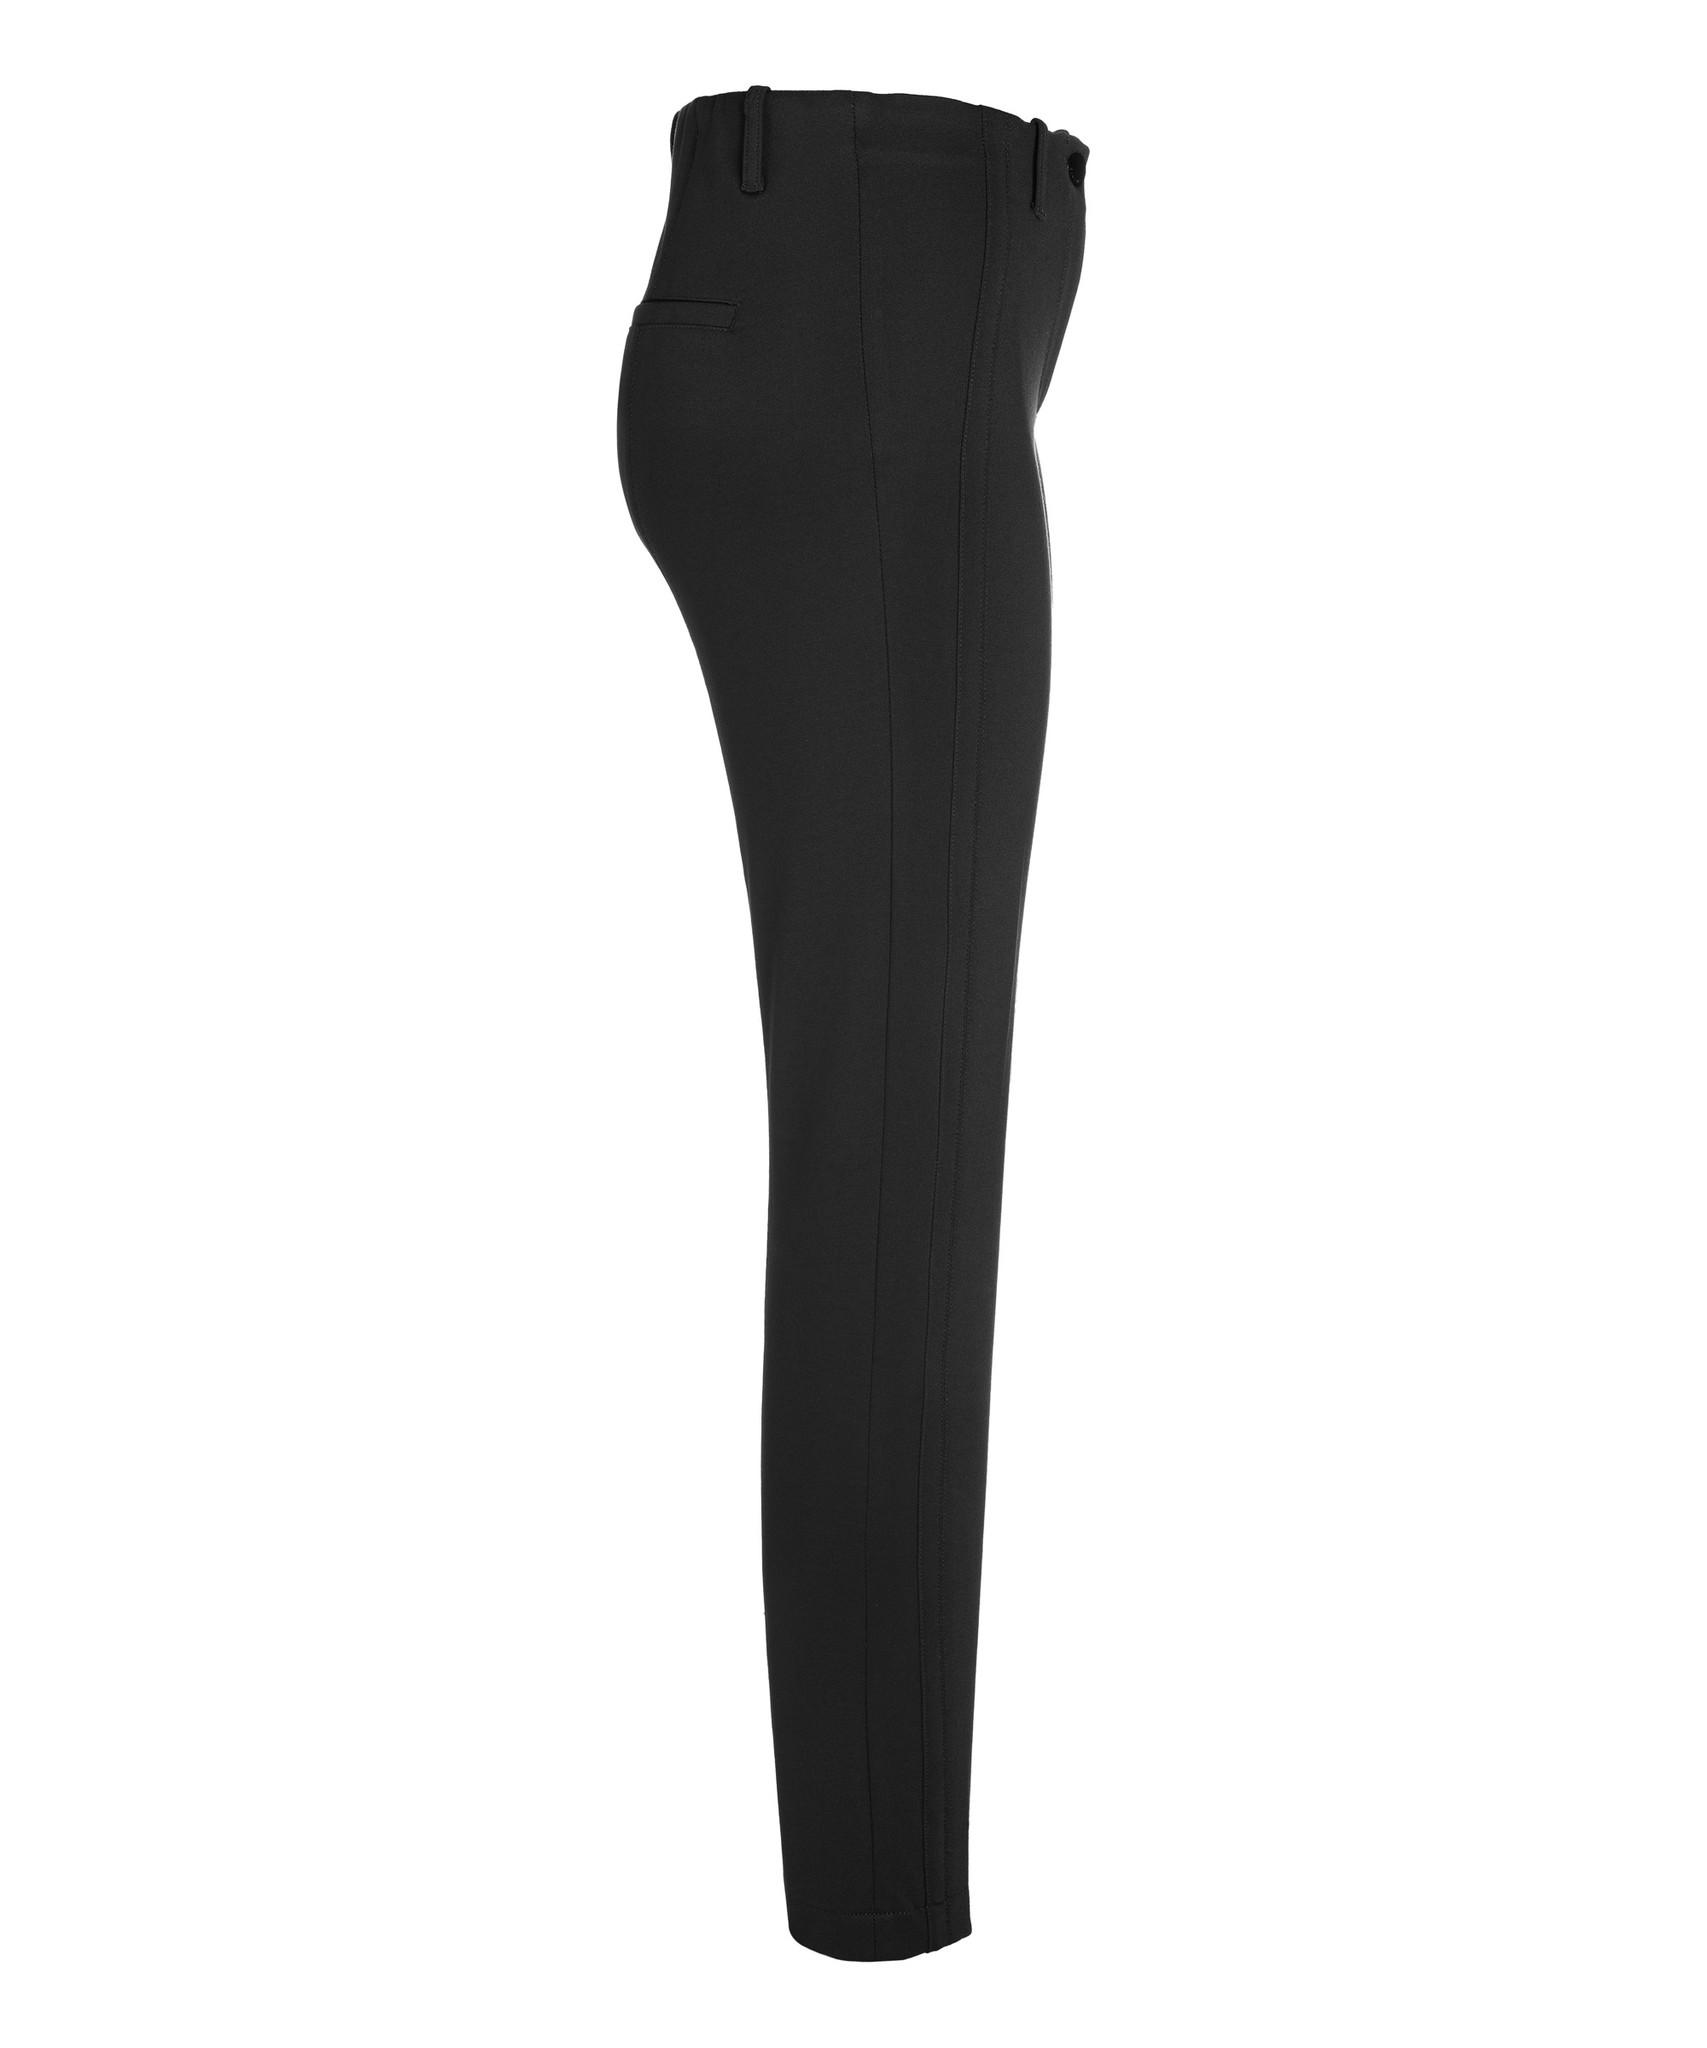 Cambio trousers ROS SEAM 6332-3